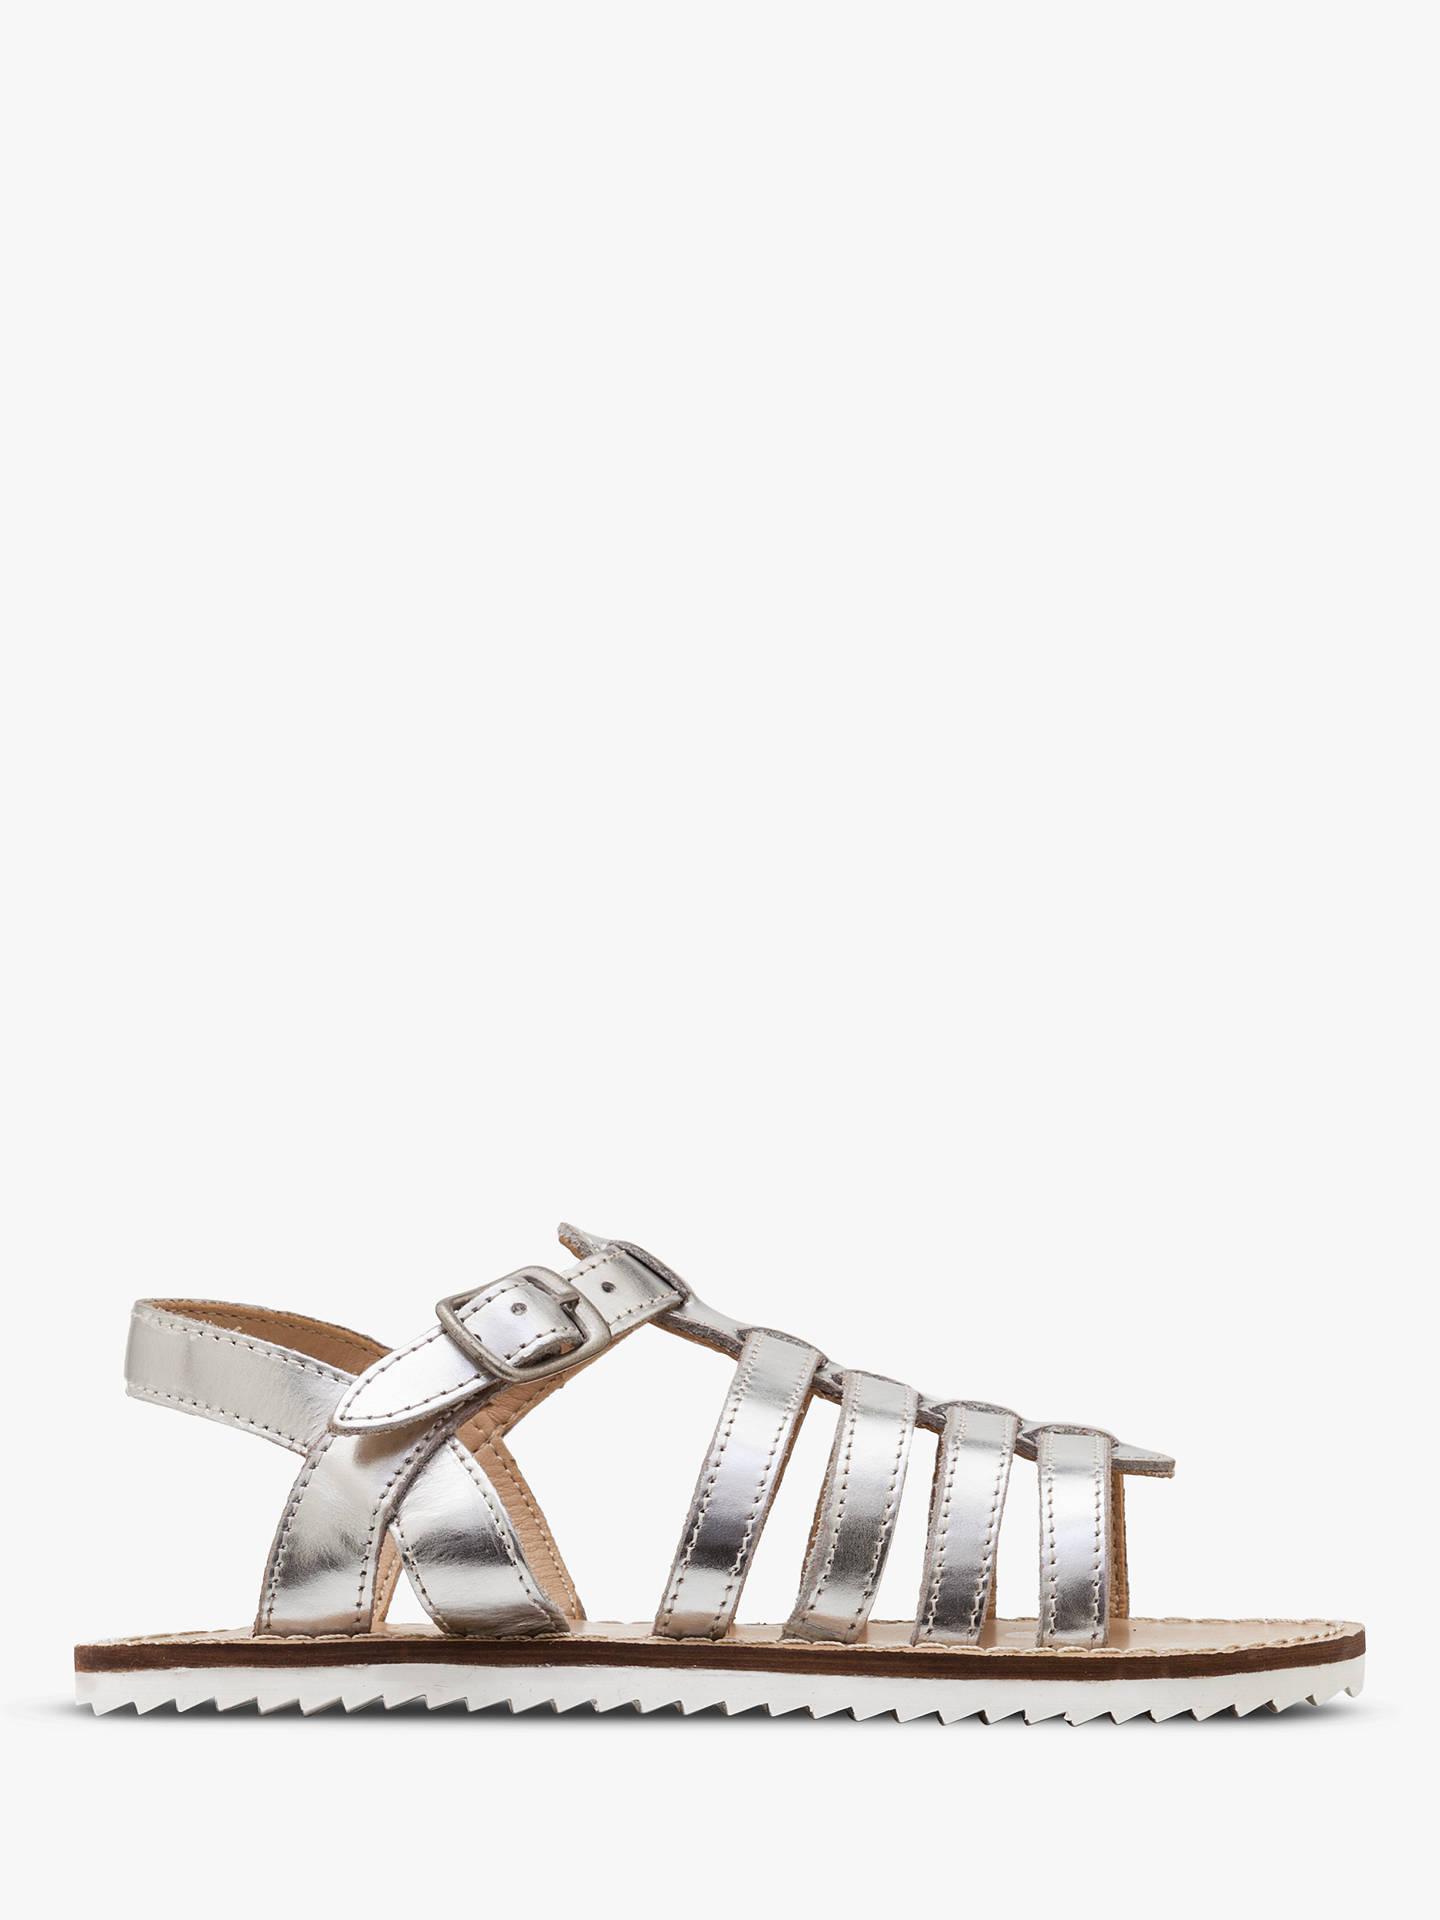 8ab2f8ab5f91 Buy Boden Children s Leather Gladiator Sandals